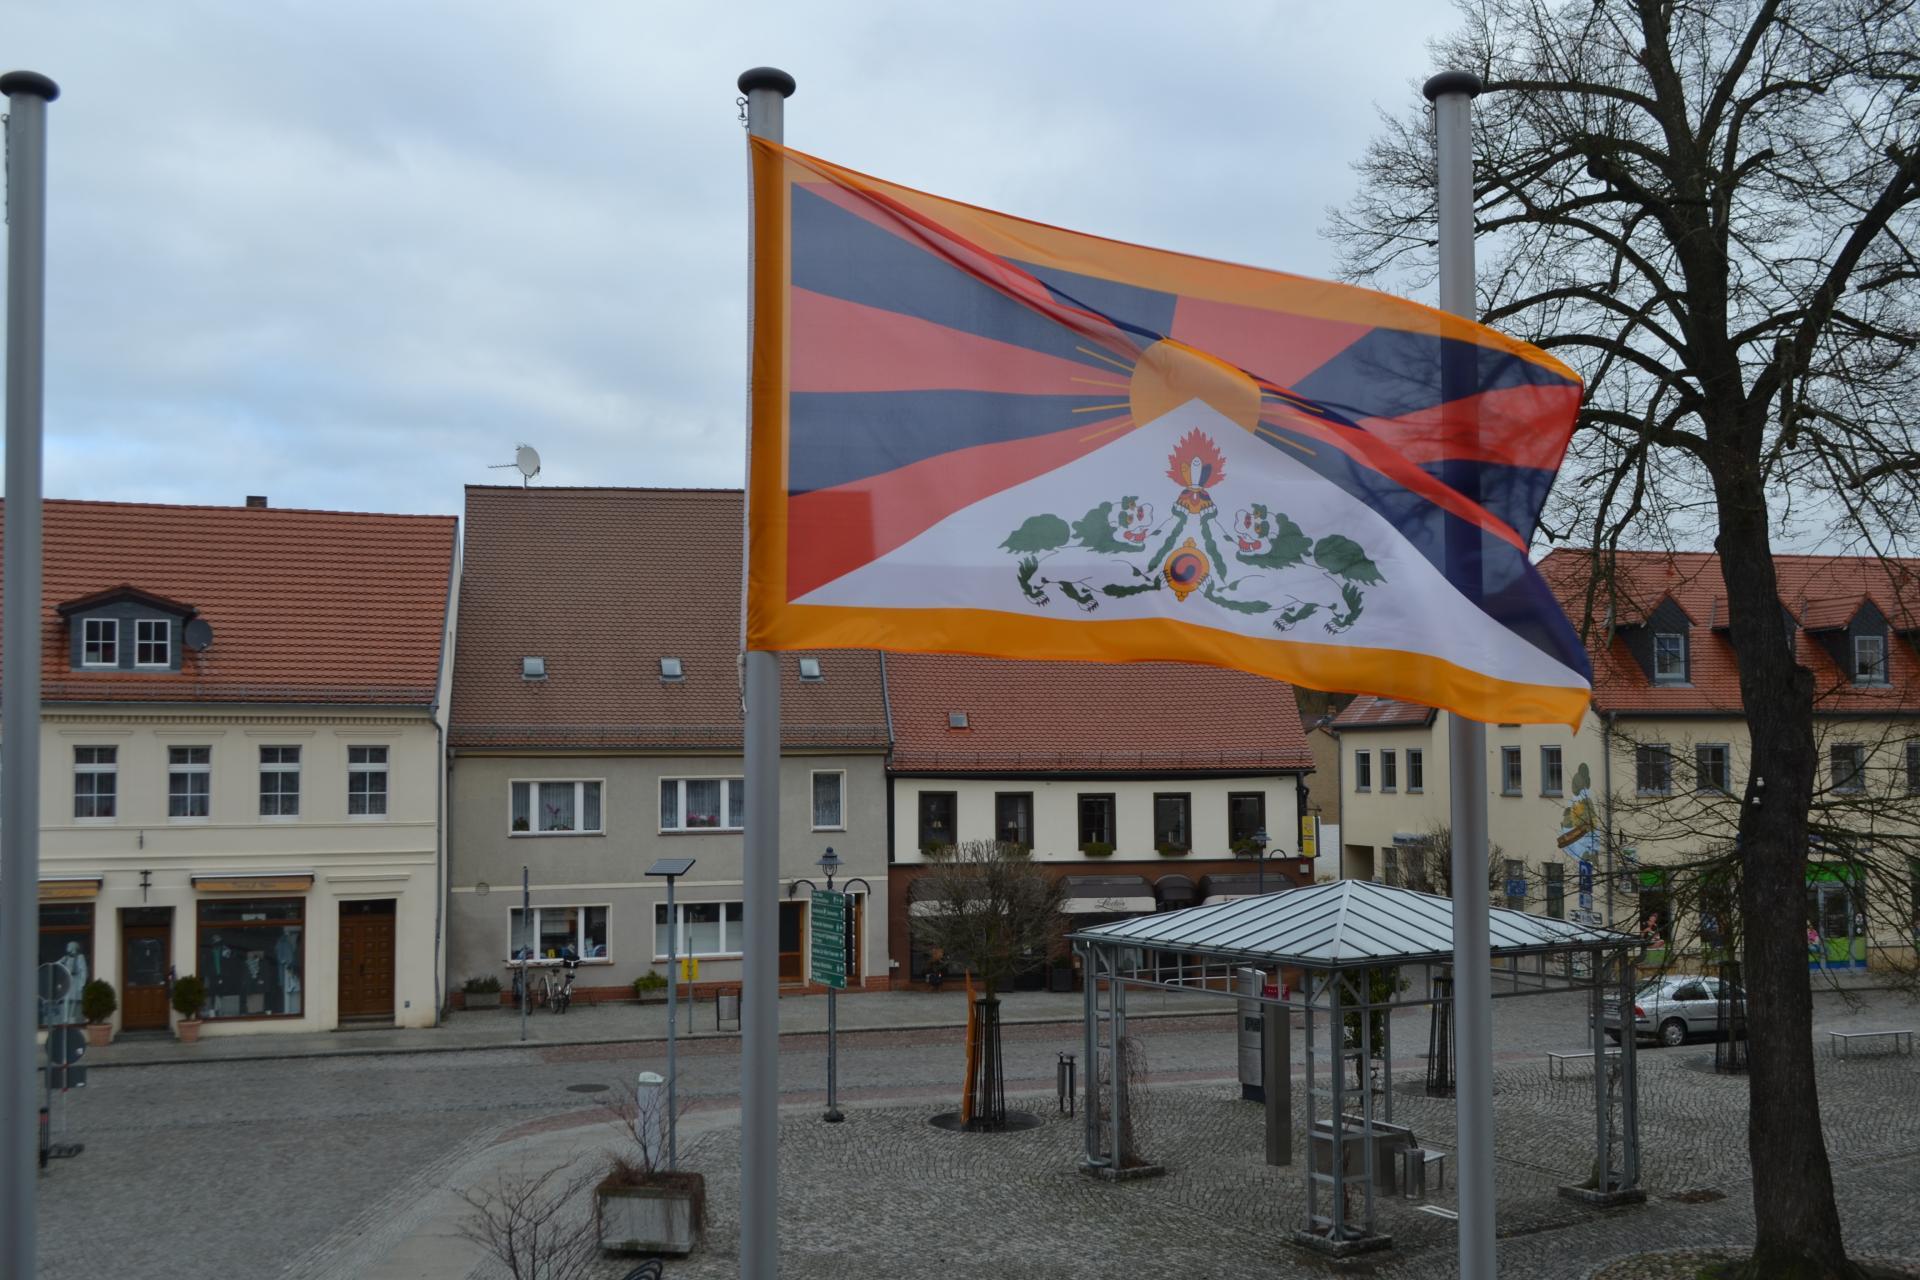 Flagge zeigen für Tibet in Lübbenau/Spreewald, Quelle: Stadt Lübbenau/Spreewald